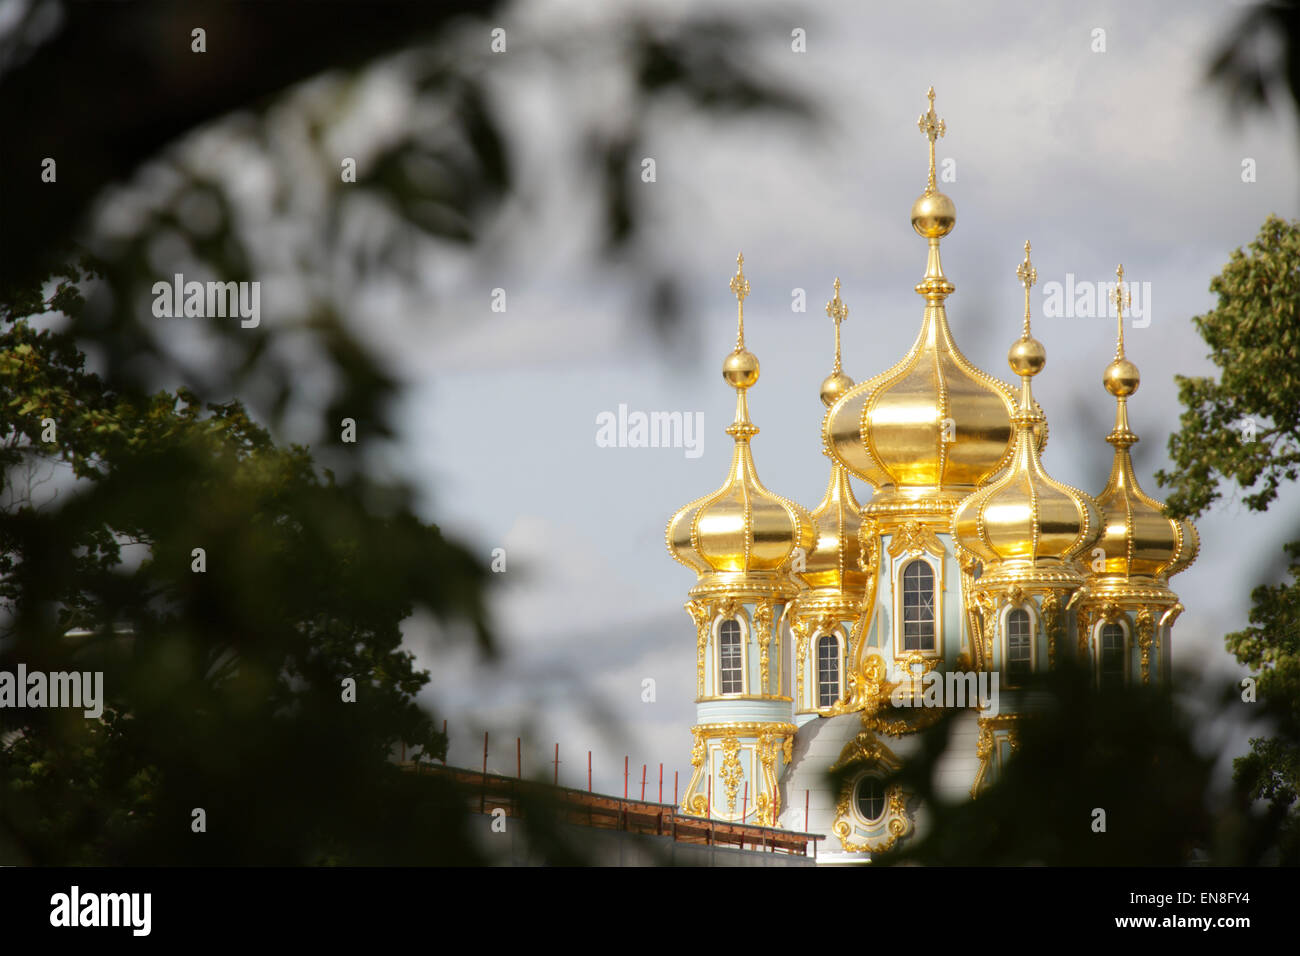 Golden dome of Catherine Palace, located in Tsarskoye Selo (Pushkin),Saint Petersburg, Russia - Stock Image